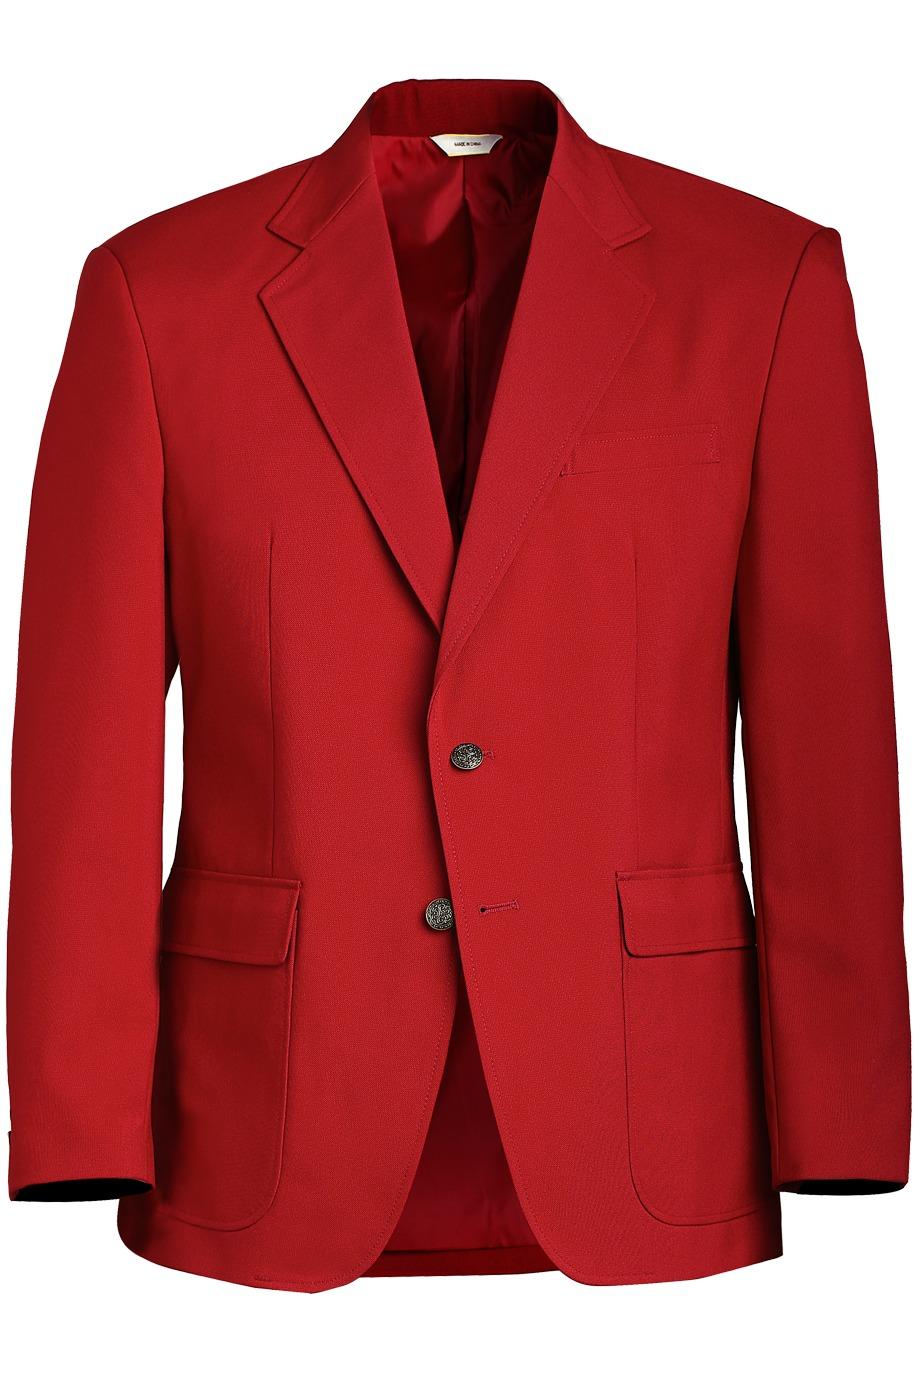 Edwards Mens Uniform Blazer Red from 69